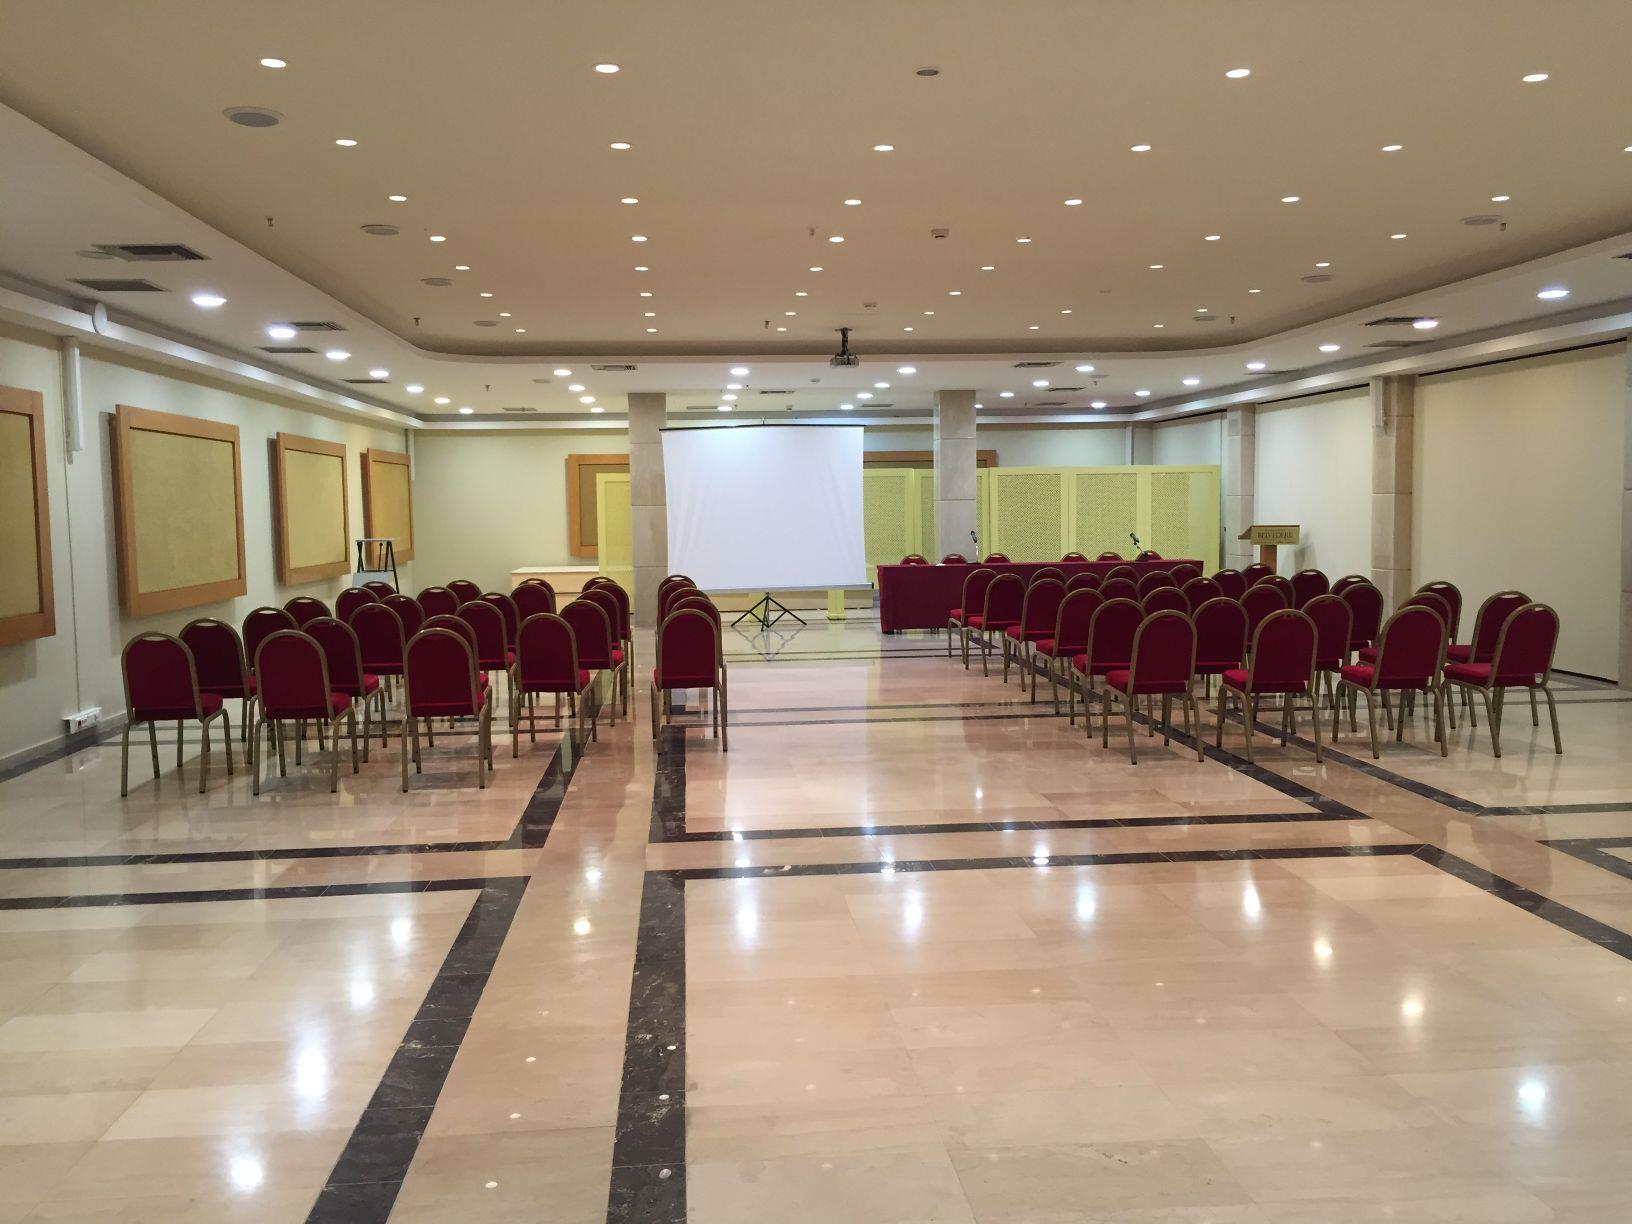 http://www.orextravel.sk/OREX/hotelphotos/royal-belvedere-general-0048.jpg